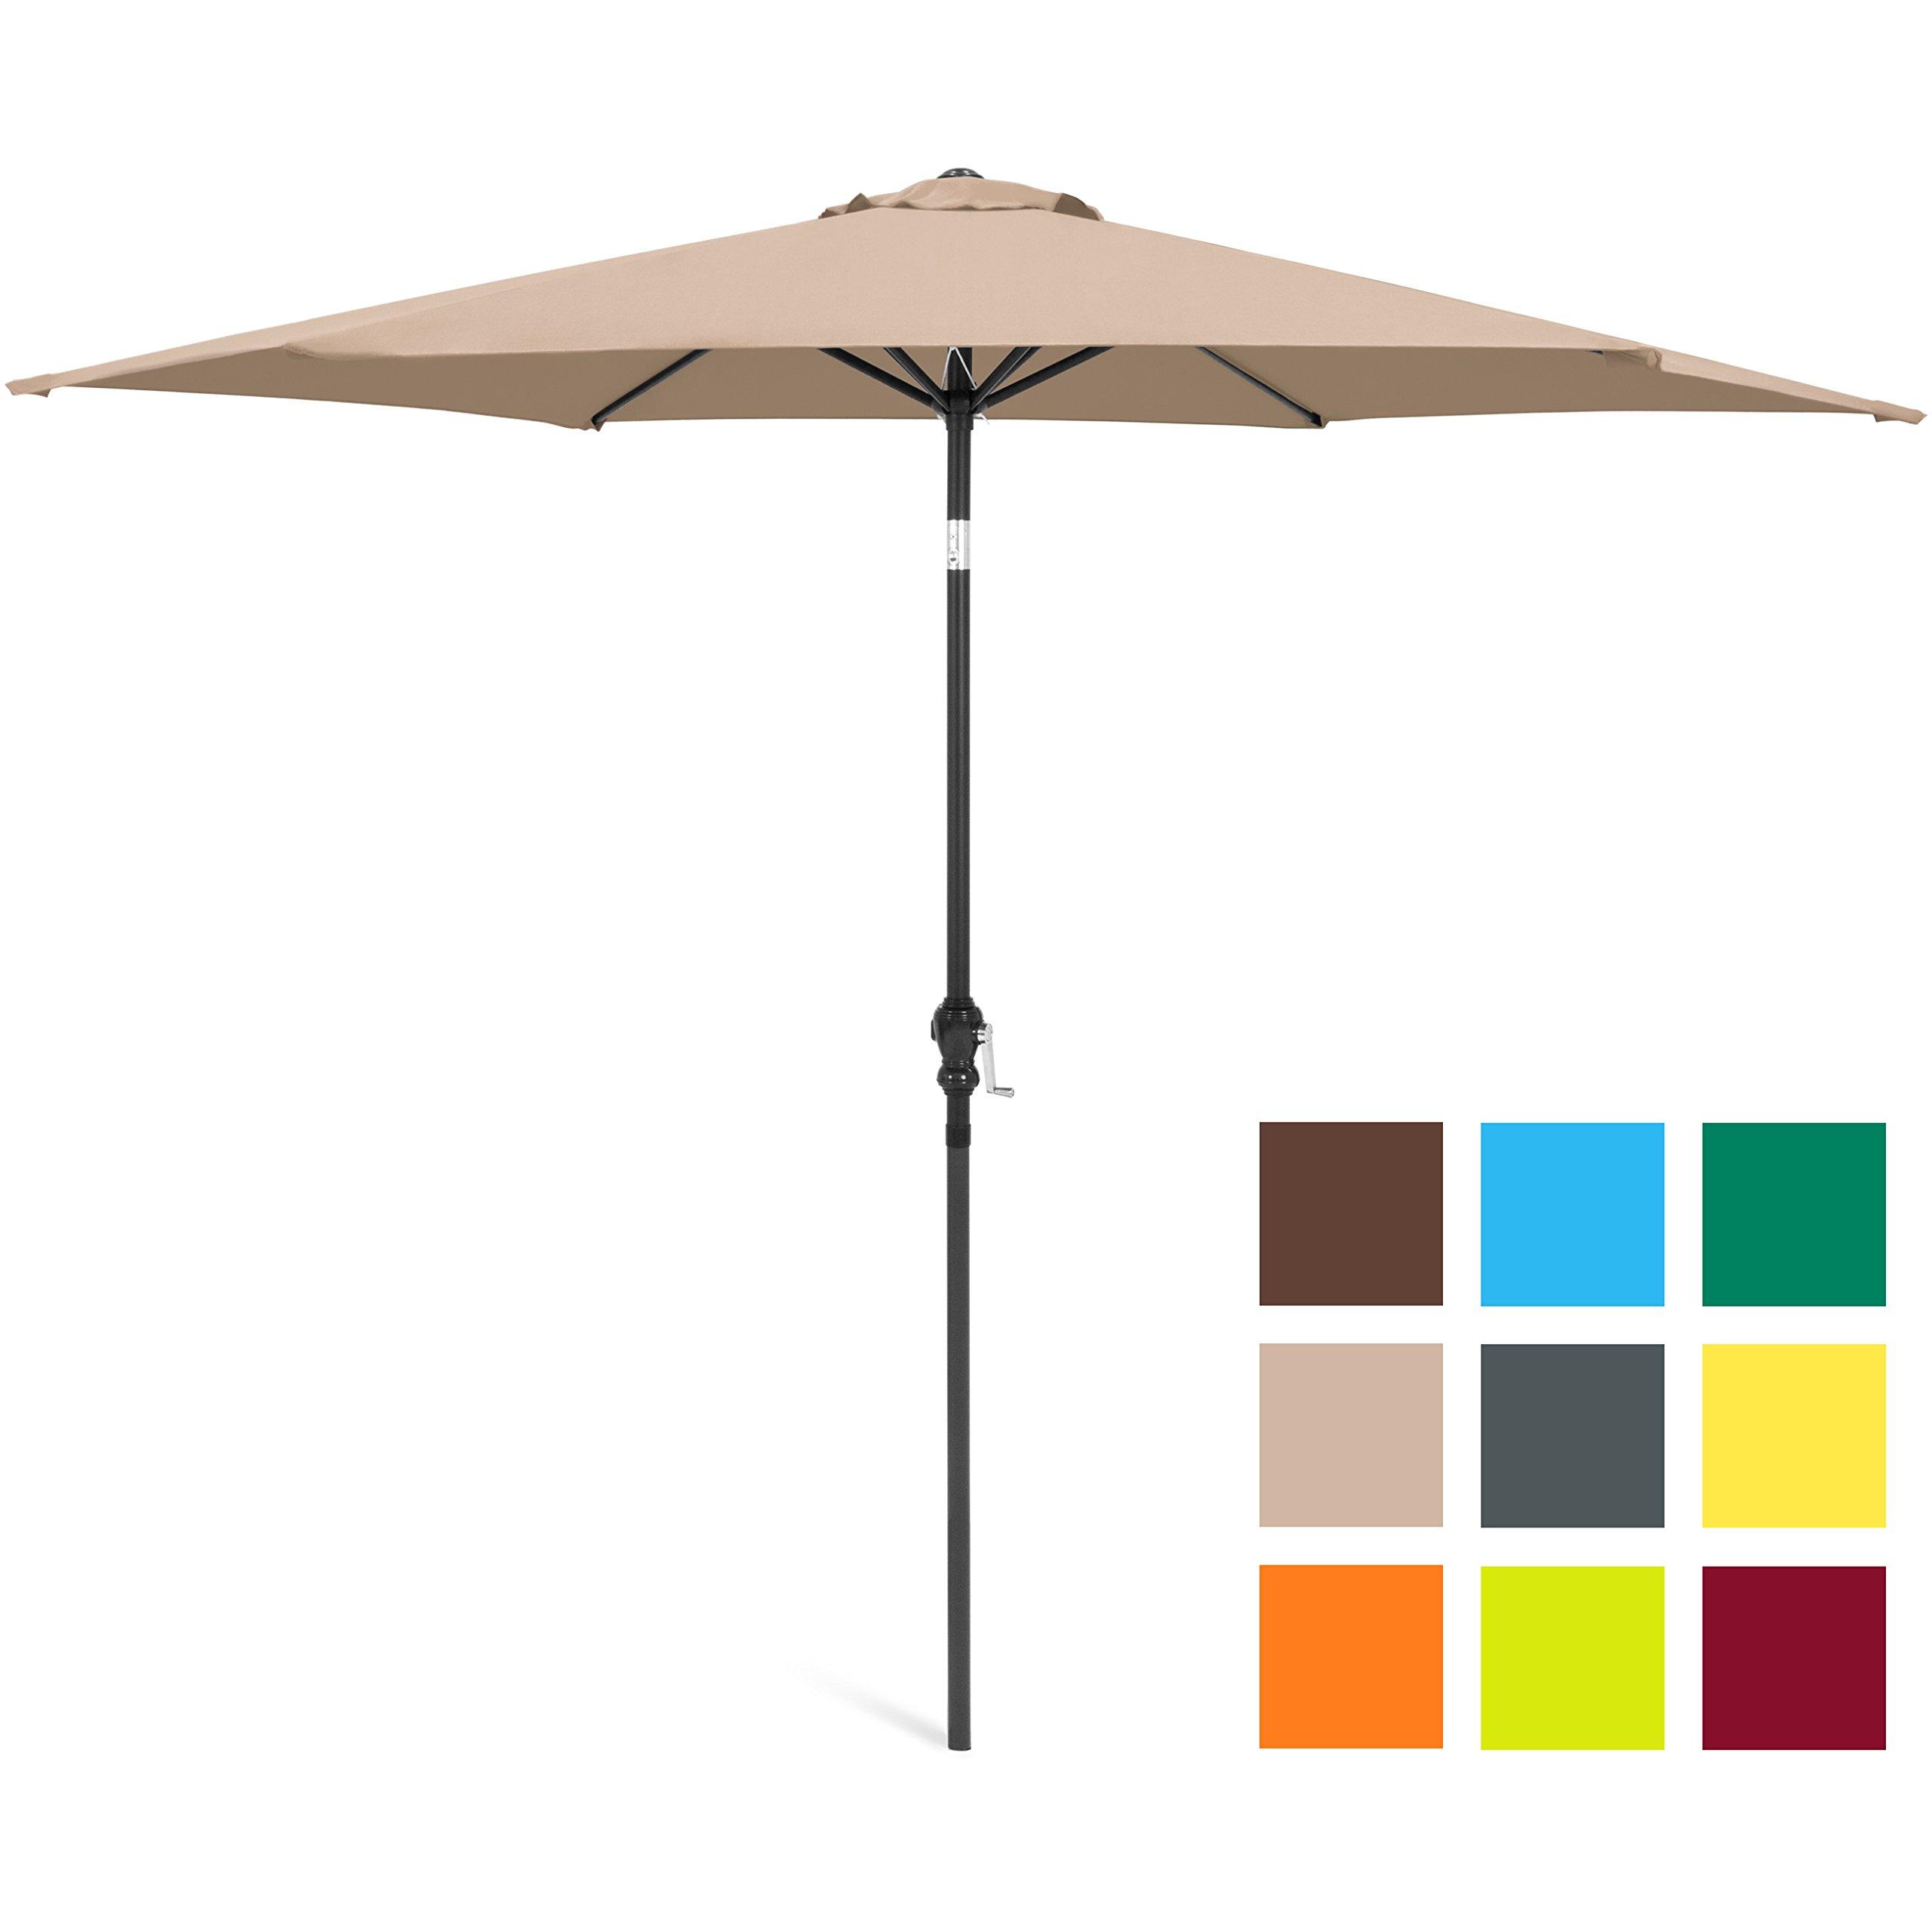 Best Choice Products 10ft Outdoor Steel Market Backyard Garden Patio Umbrella w/ Crank, Easy Push Button Tilt, 6 Ribs, Table Compatible - Tan